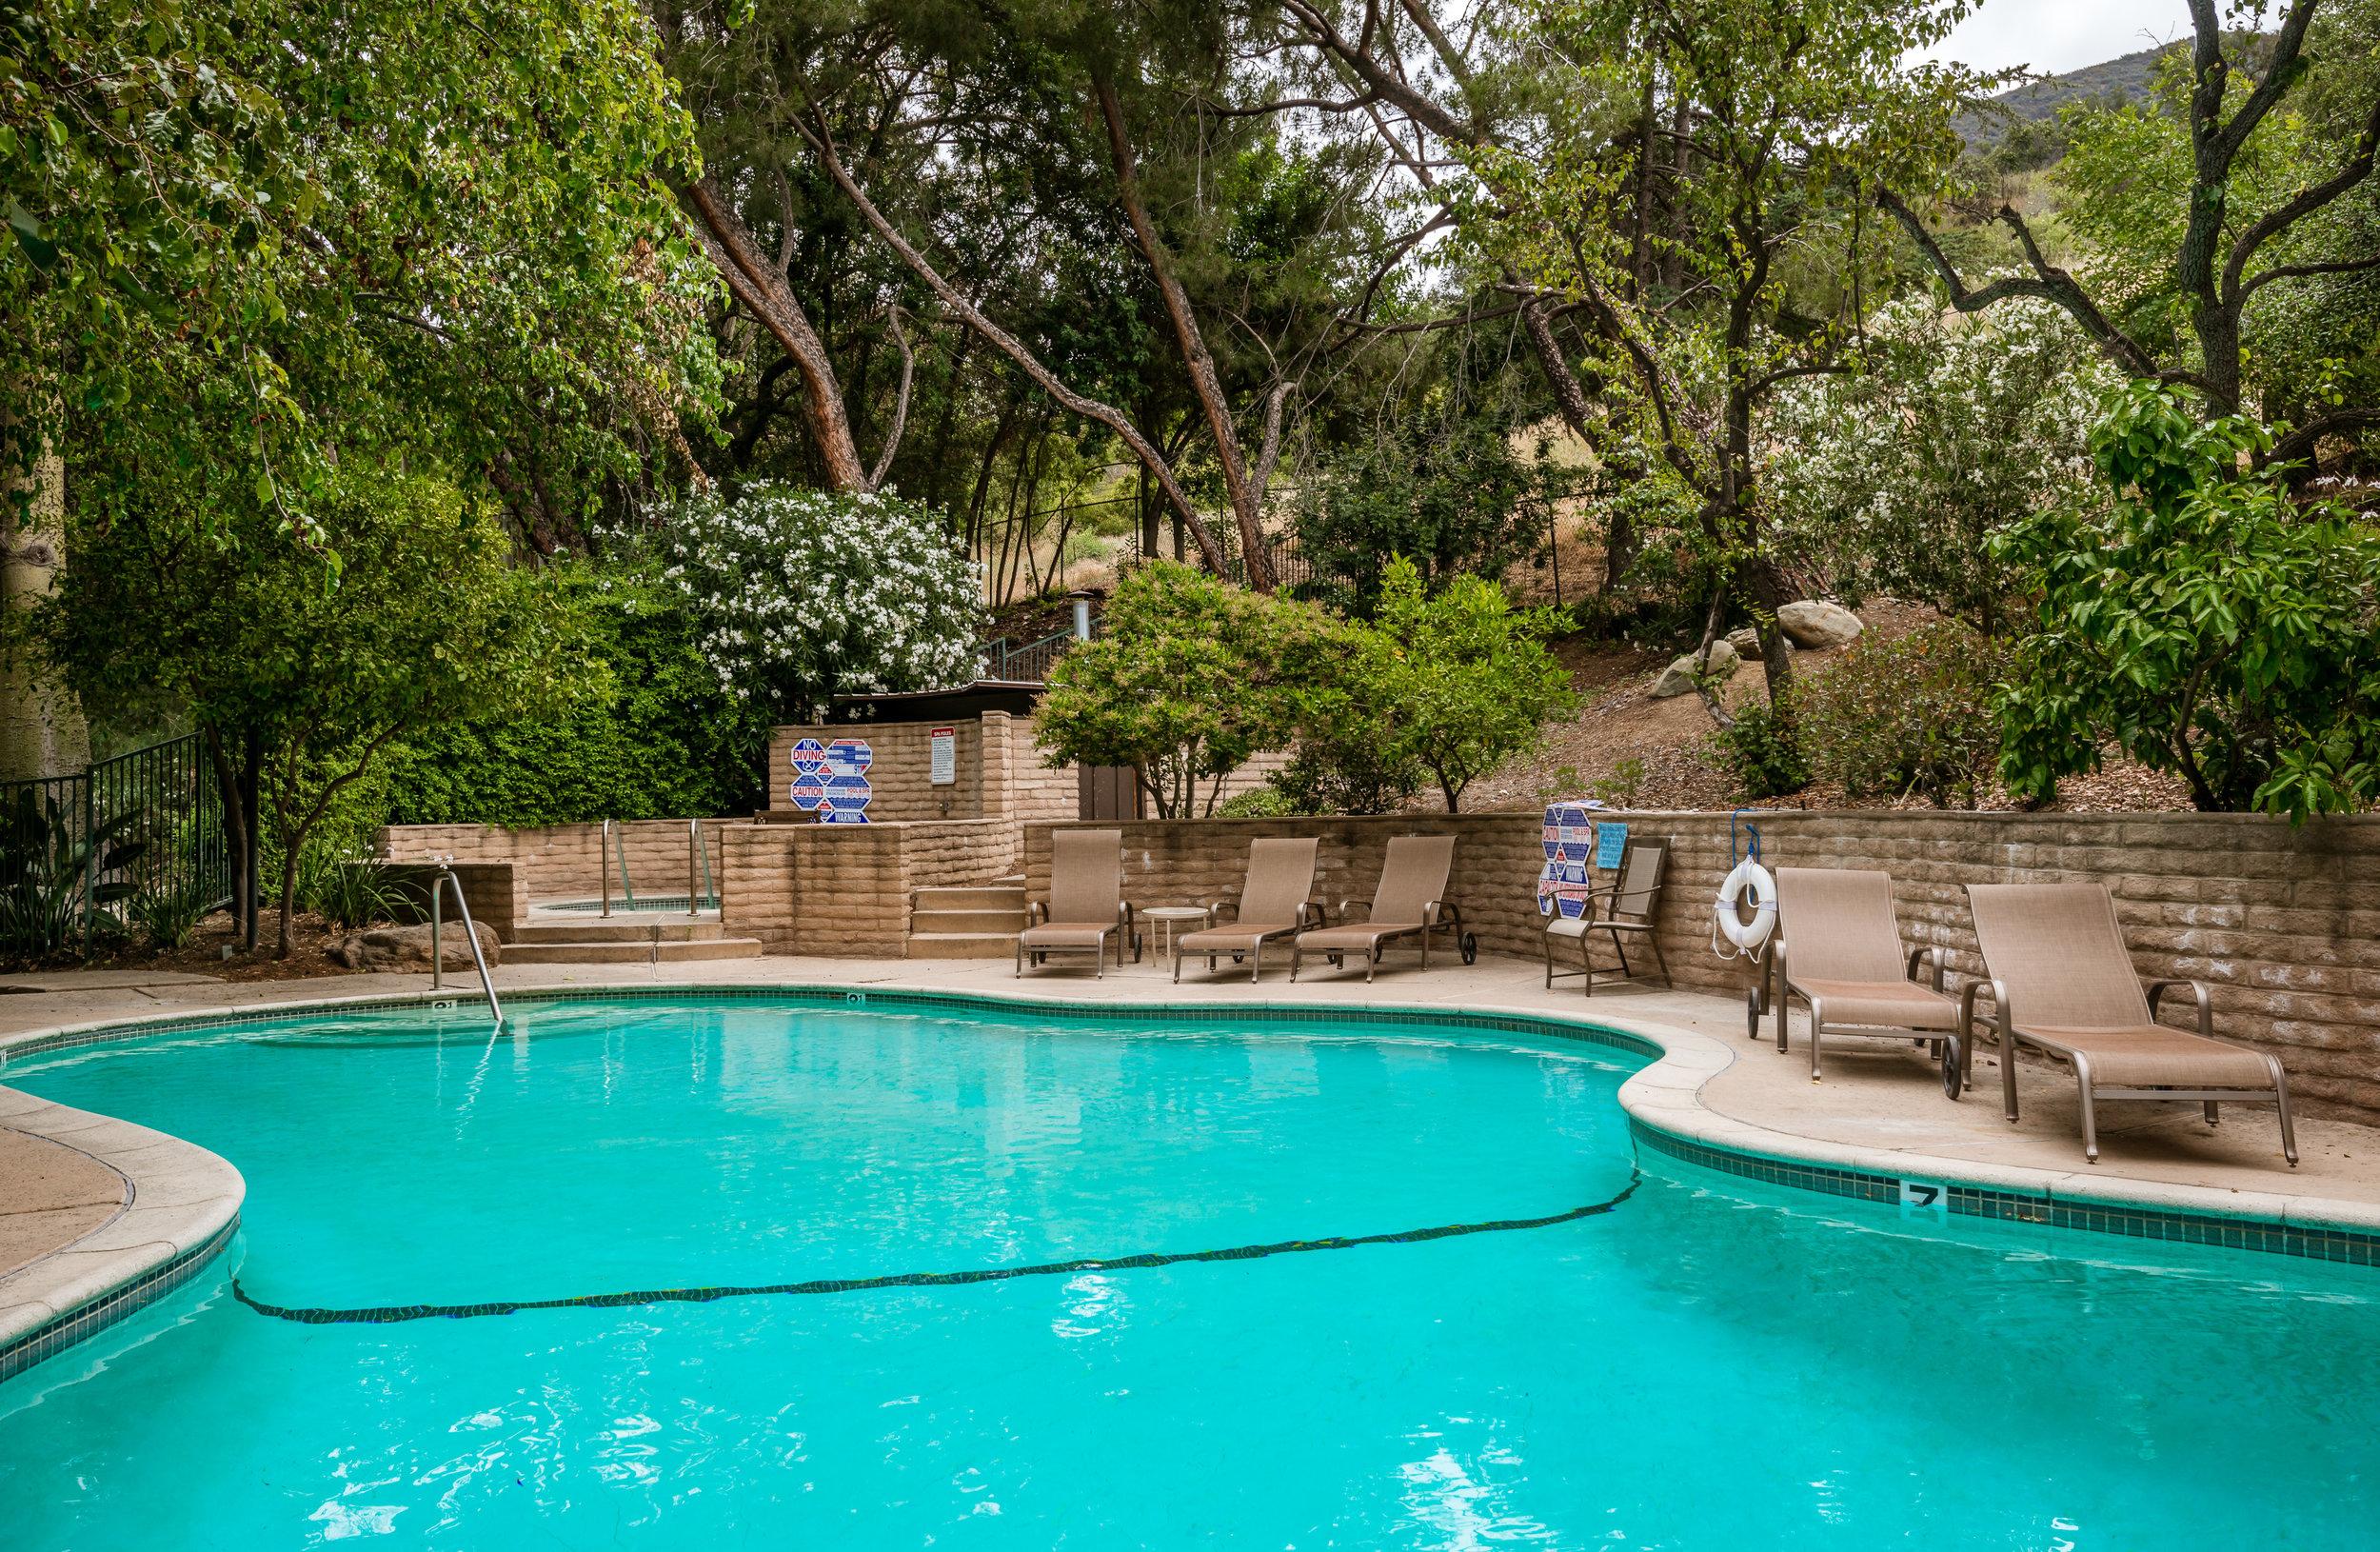 Barham Swimming Pool View 2.jpg